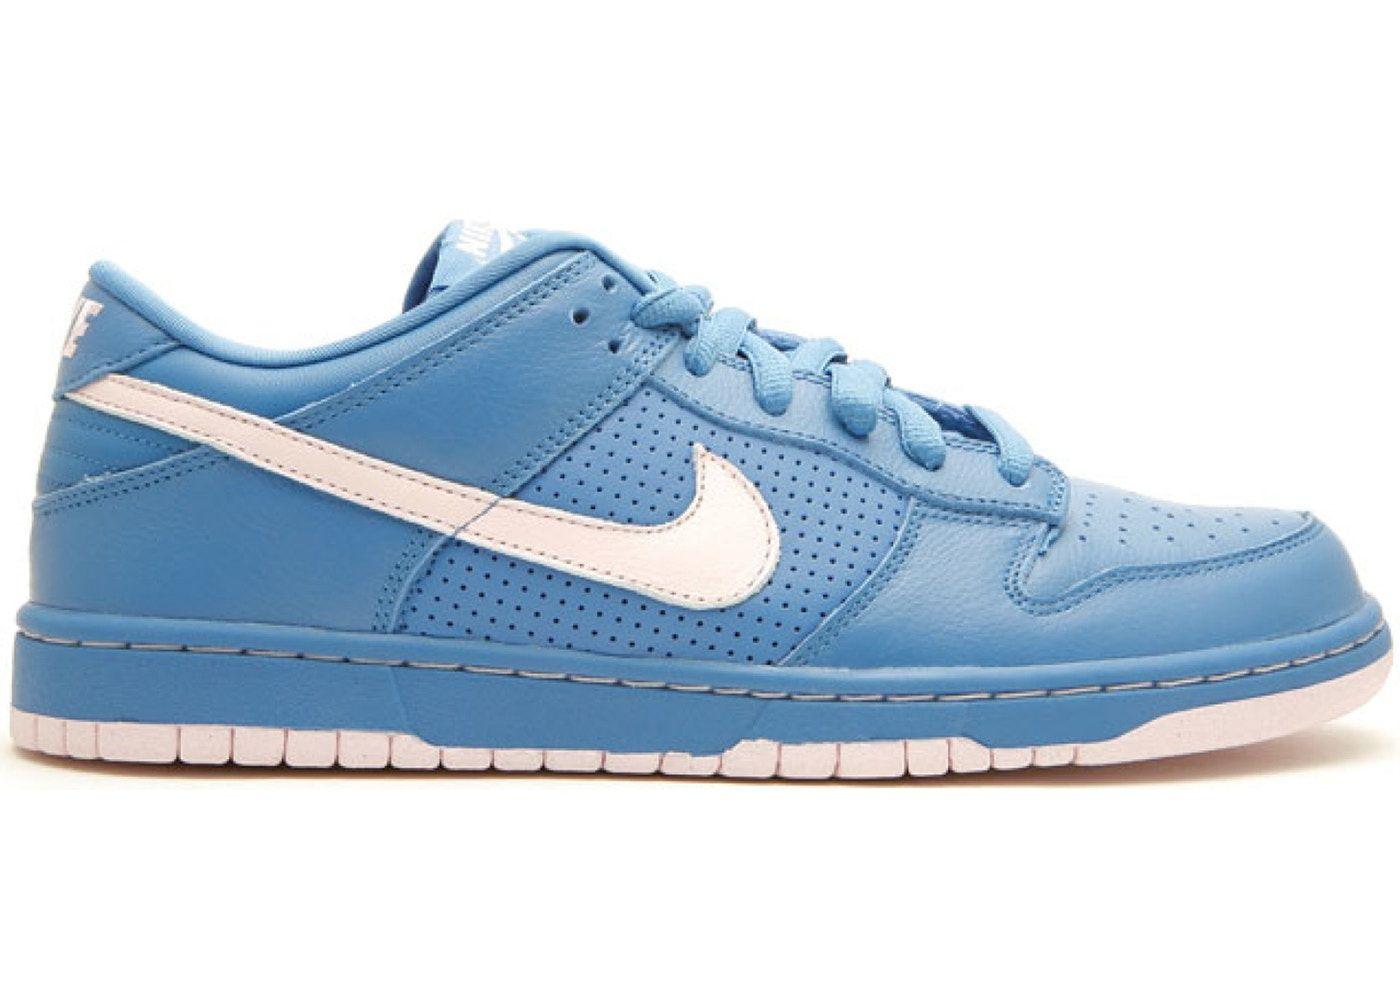 Repegar inoxidable Hay una tendencia  Nike SB Dunk Low Varsity Blue Pink Ice   Nike sb dunks, Nike sb, Mens vans  shoes